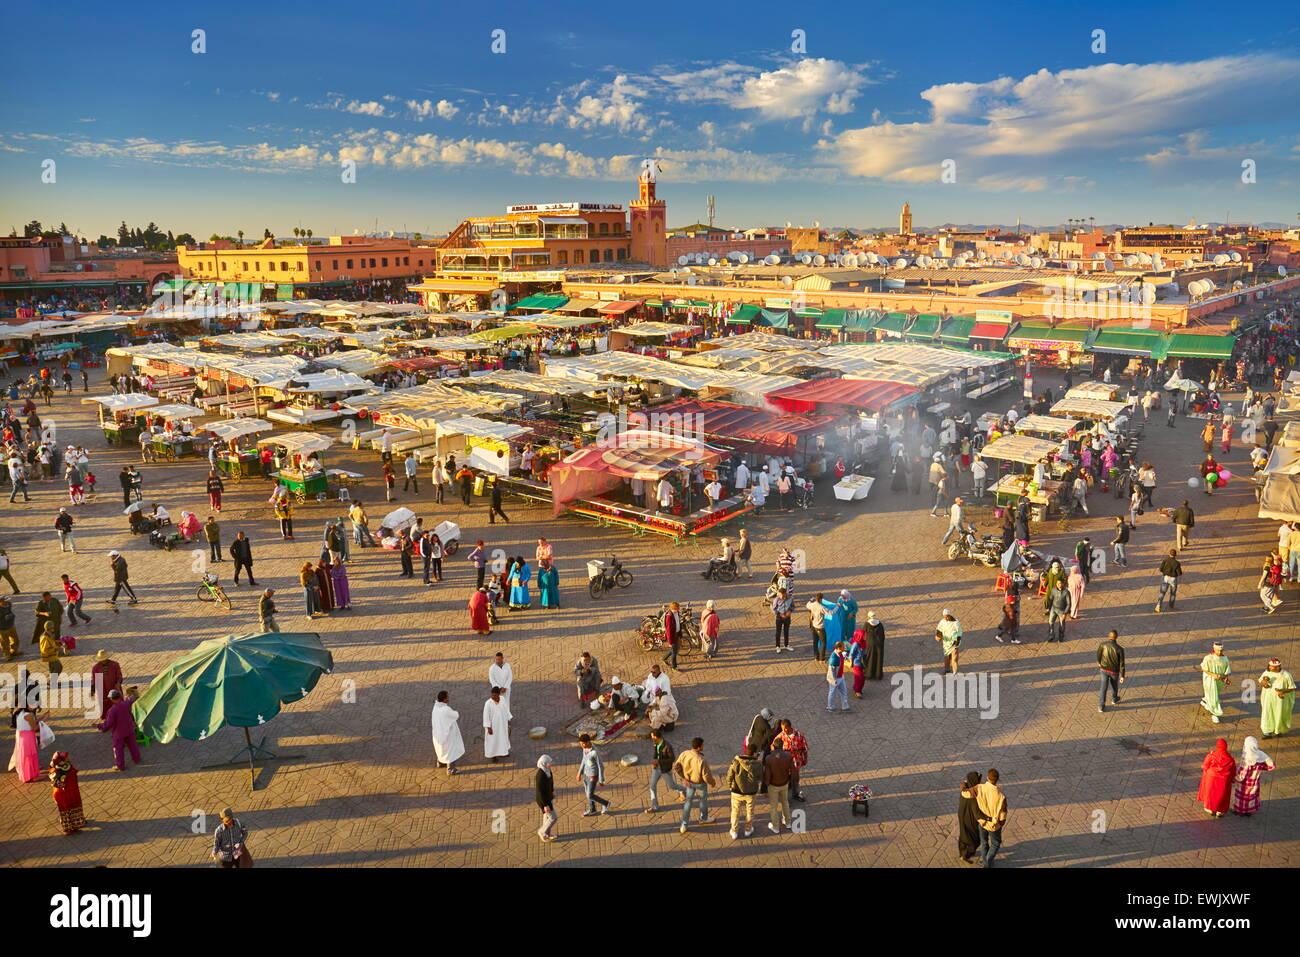 Plaza Djemaa el-Fna, Marrakech Medina, Marruecos, África Imagen De Stock